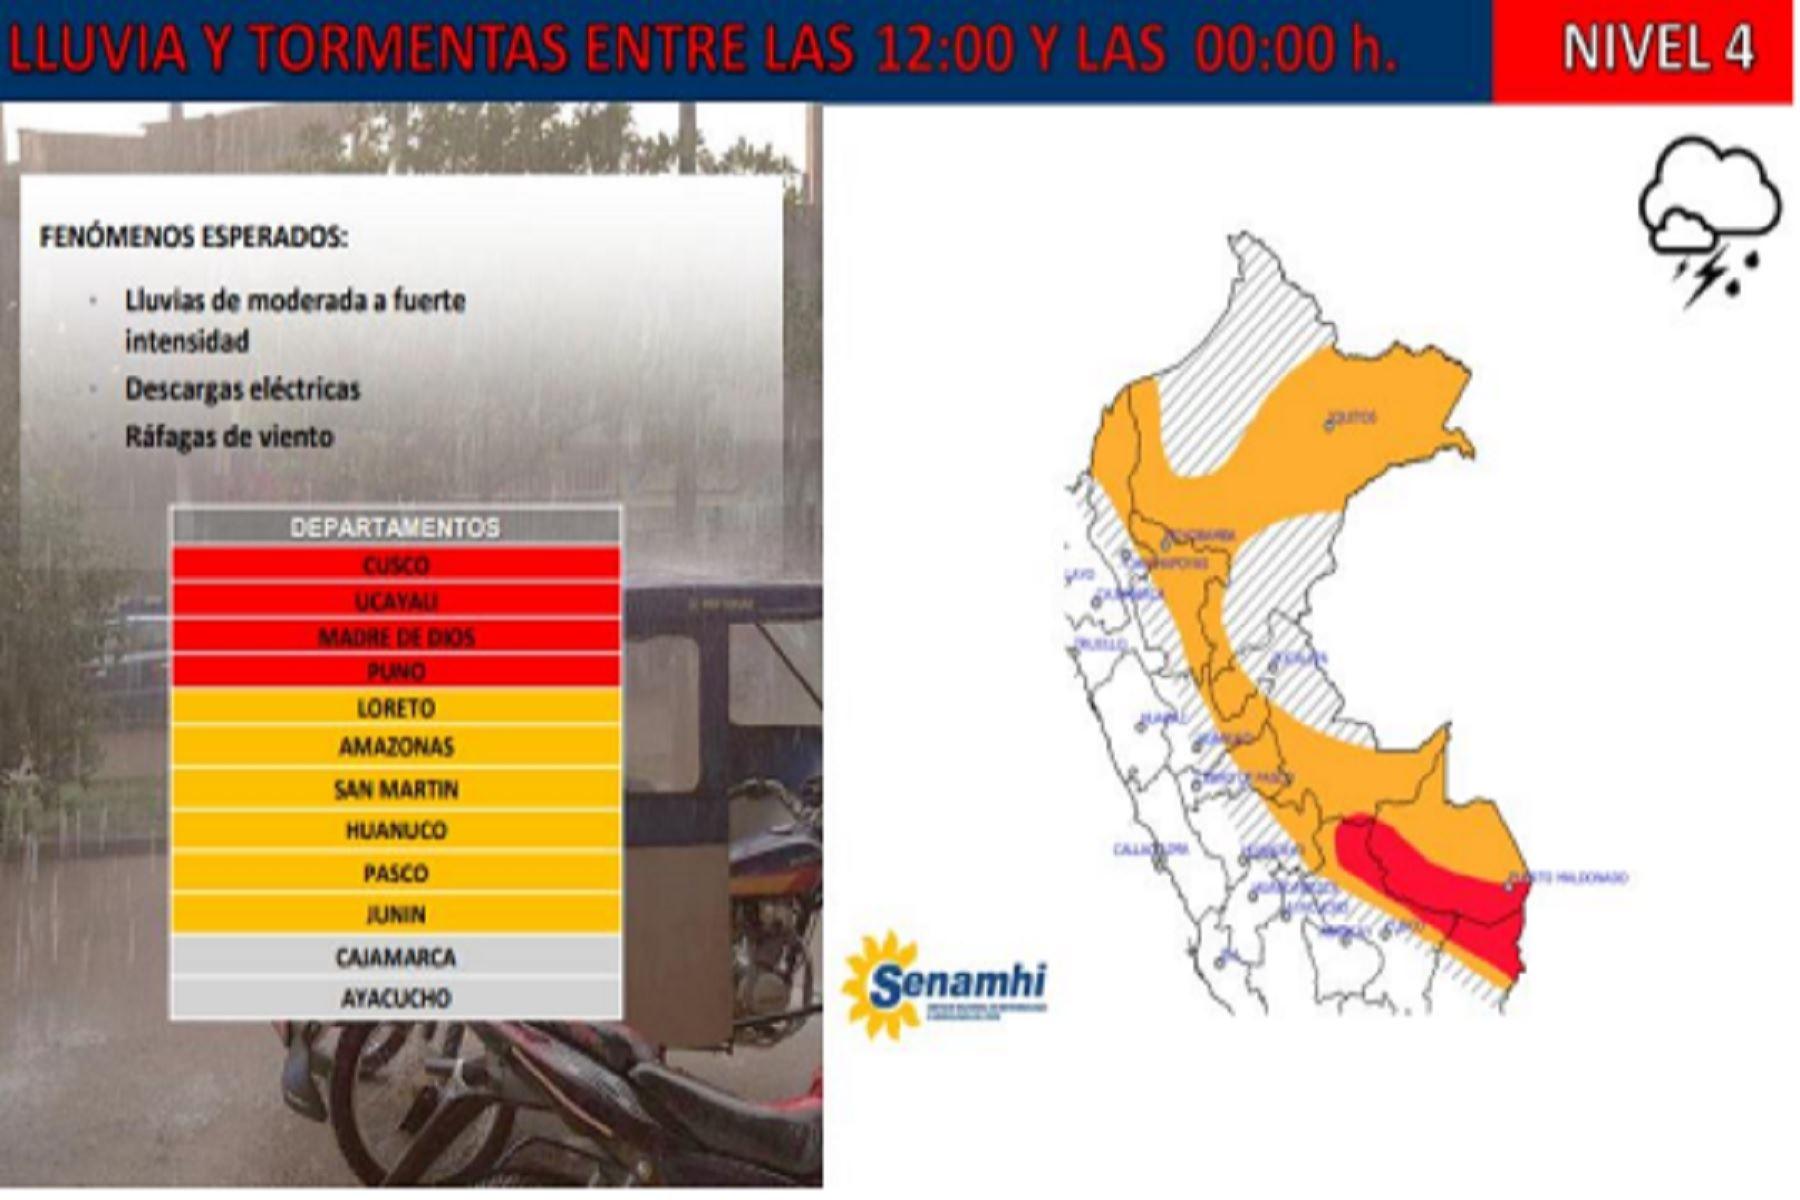 Lluvias intensas se esperan en estas zonas del Perú — Senamhi